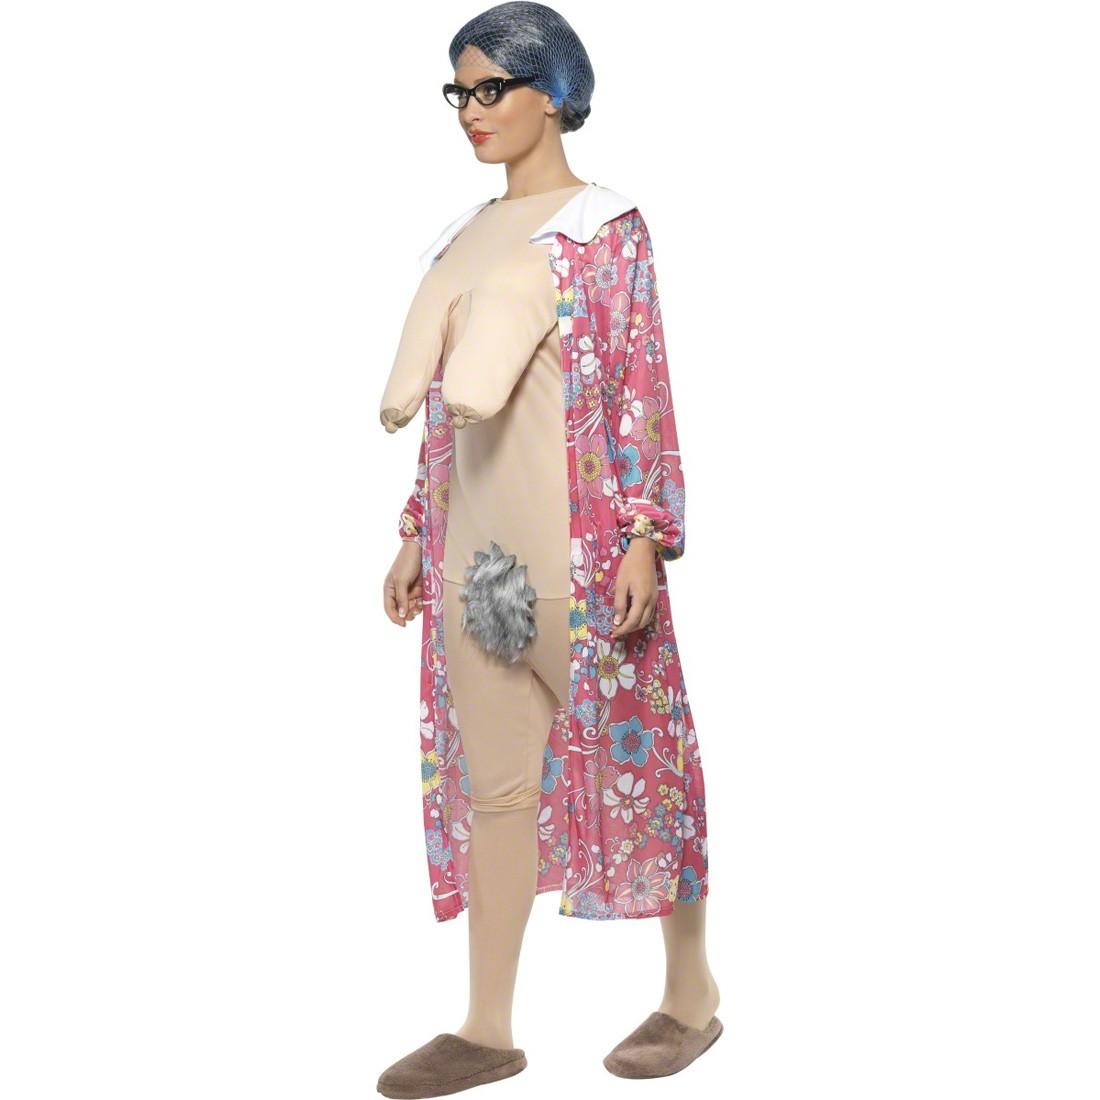 oma kost m alte frau mehrfarbig m 40 42 gro mutter kost m oma verkleidung nacktkost m. Black Bedroom Furniture Sets. Home Design Ideas